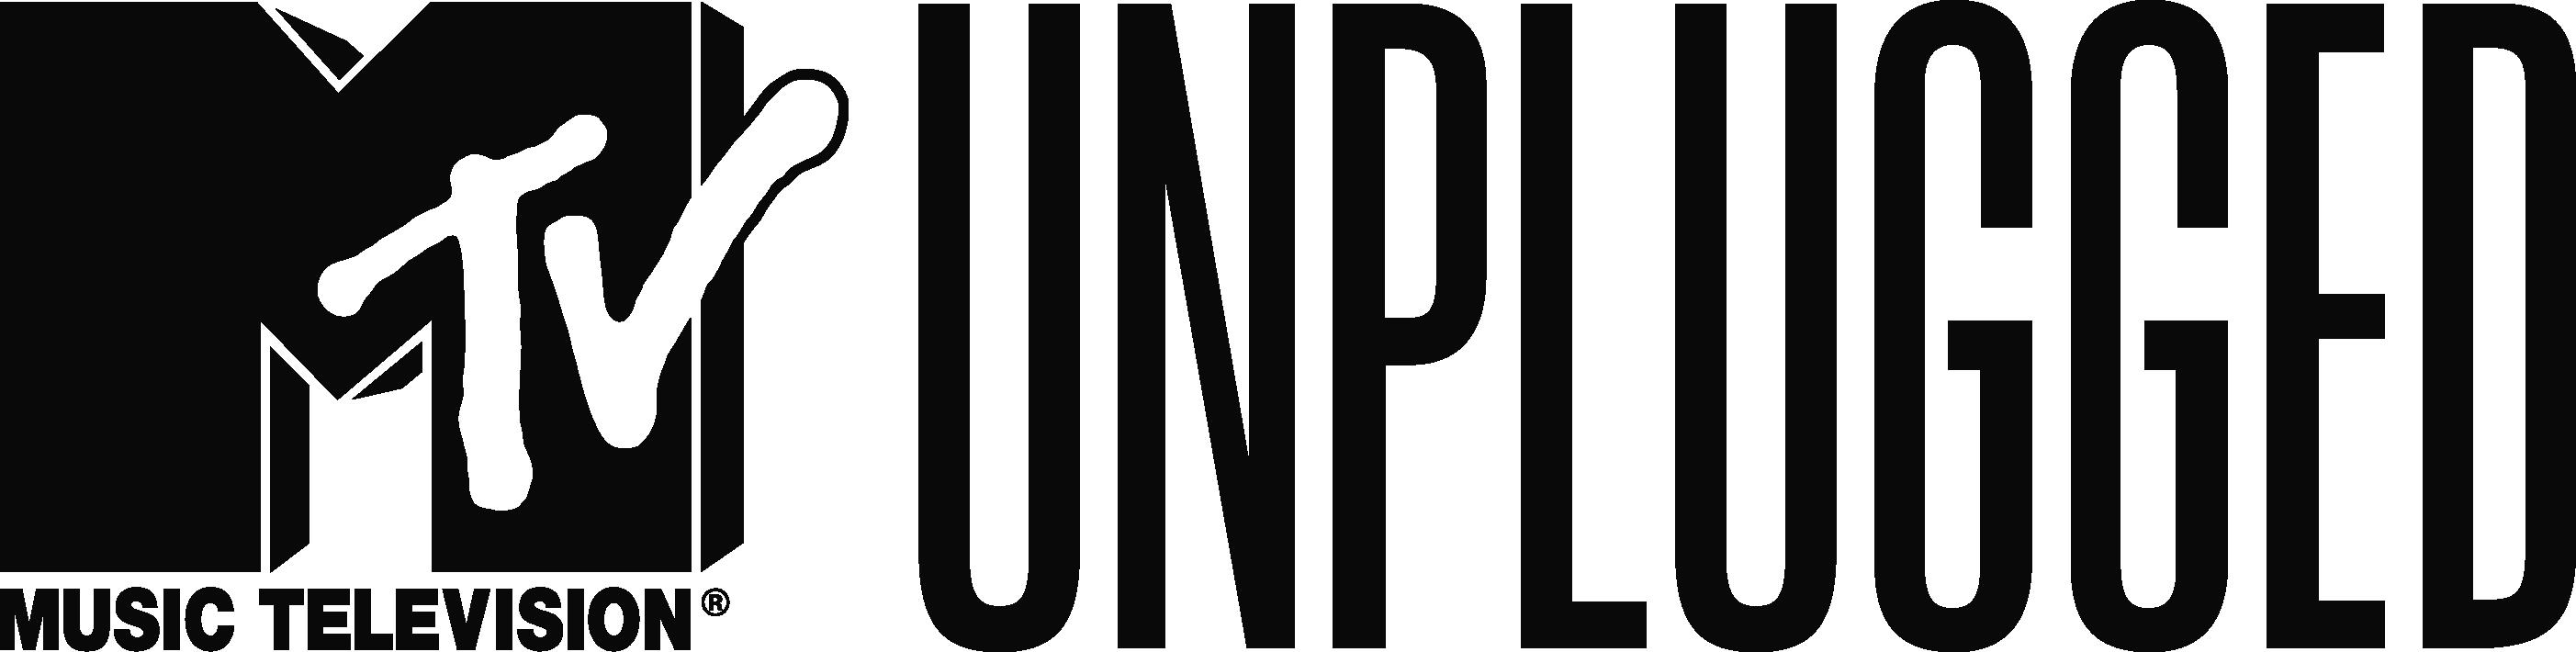 8 of the Best MTV Unplugged Performances - 8List ph